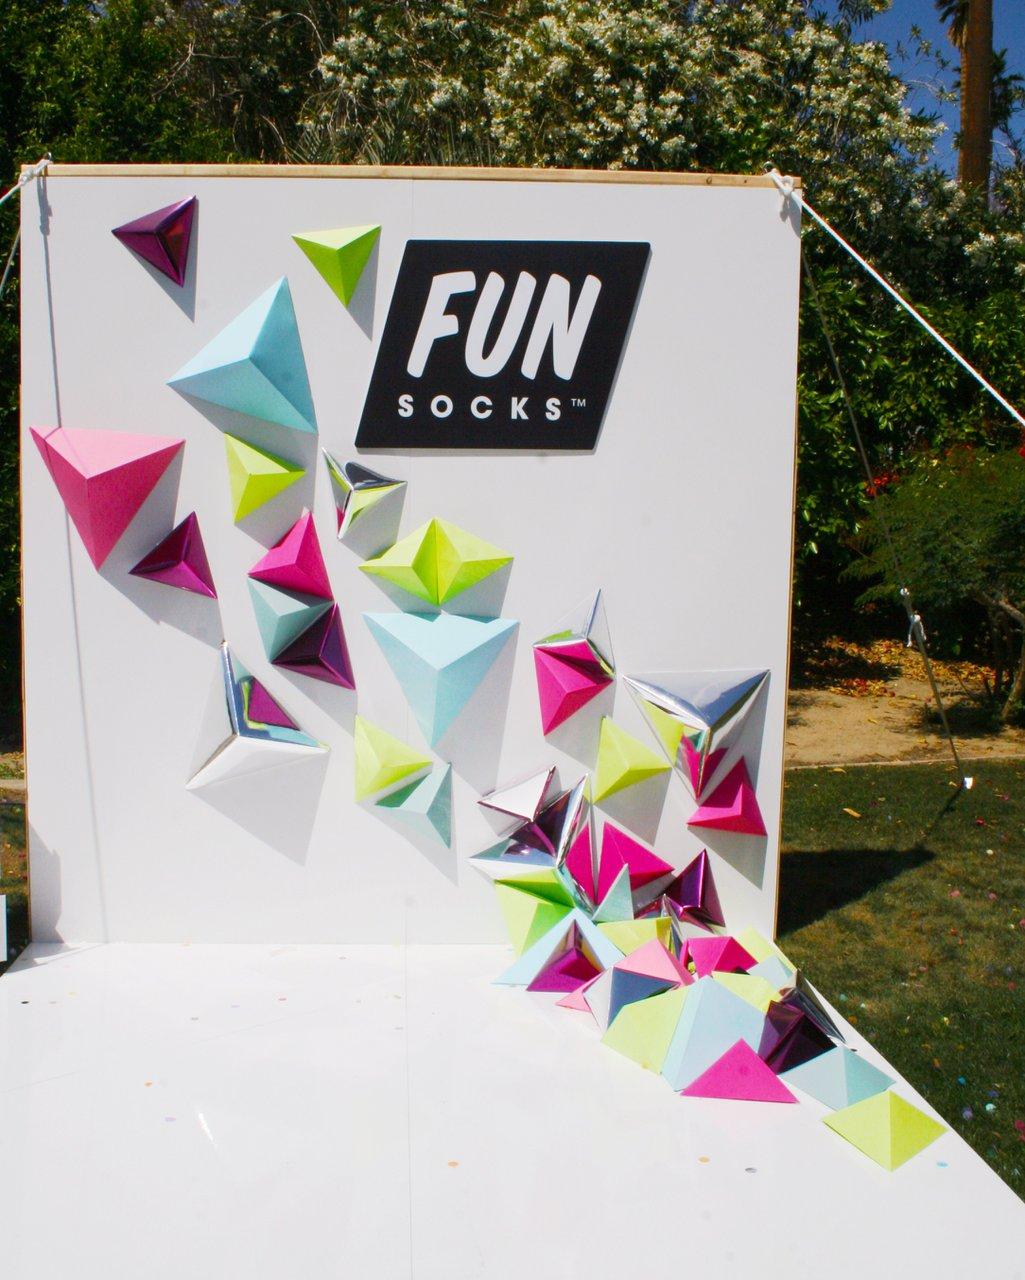 Fun Socks at Coachella photo 1558225080321_Fun%20Socks%20at%20Coachella.jpeg